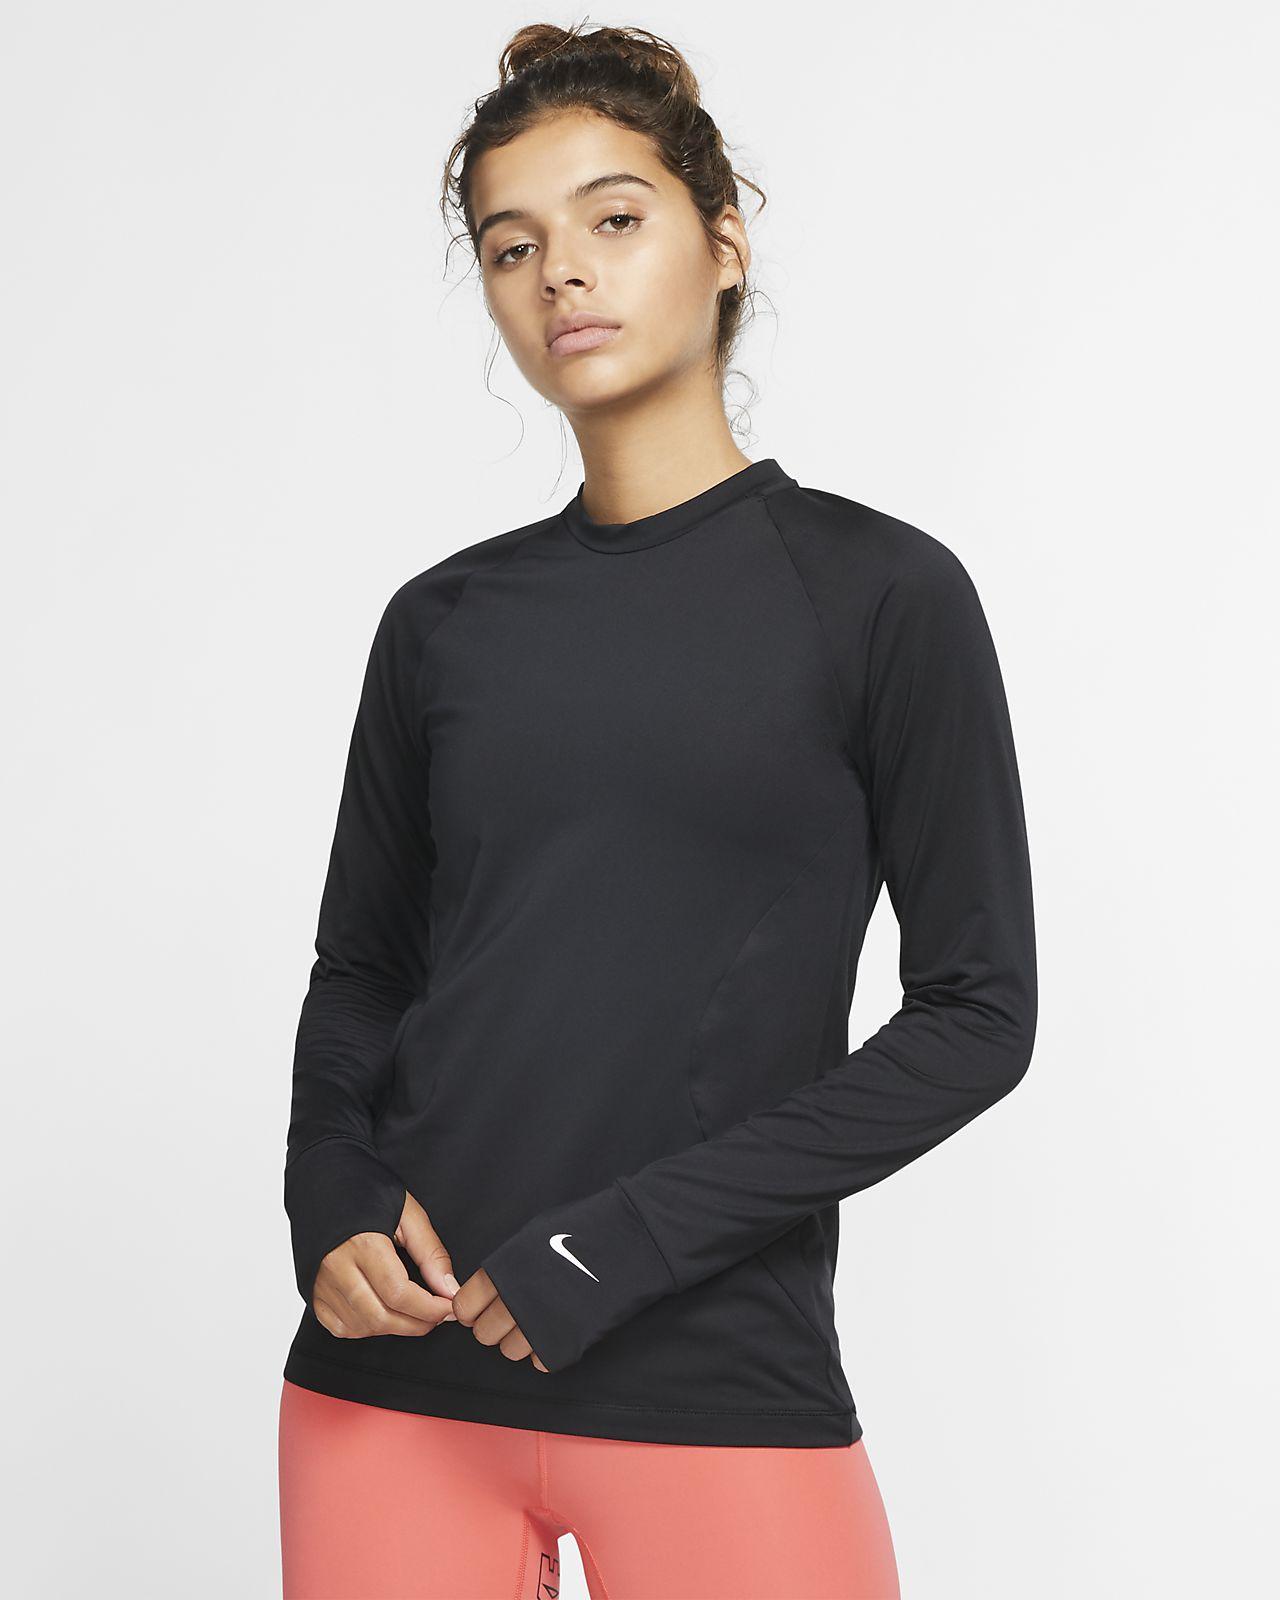 Camisola de manga comprida Nike Pro Warm para mulher